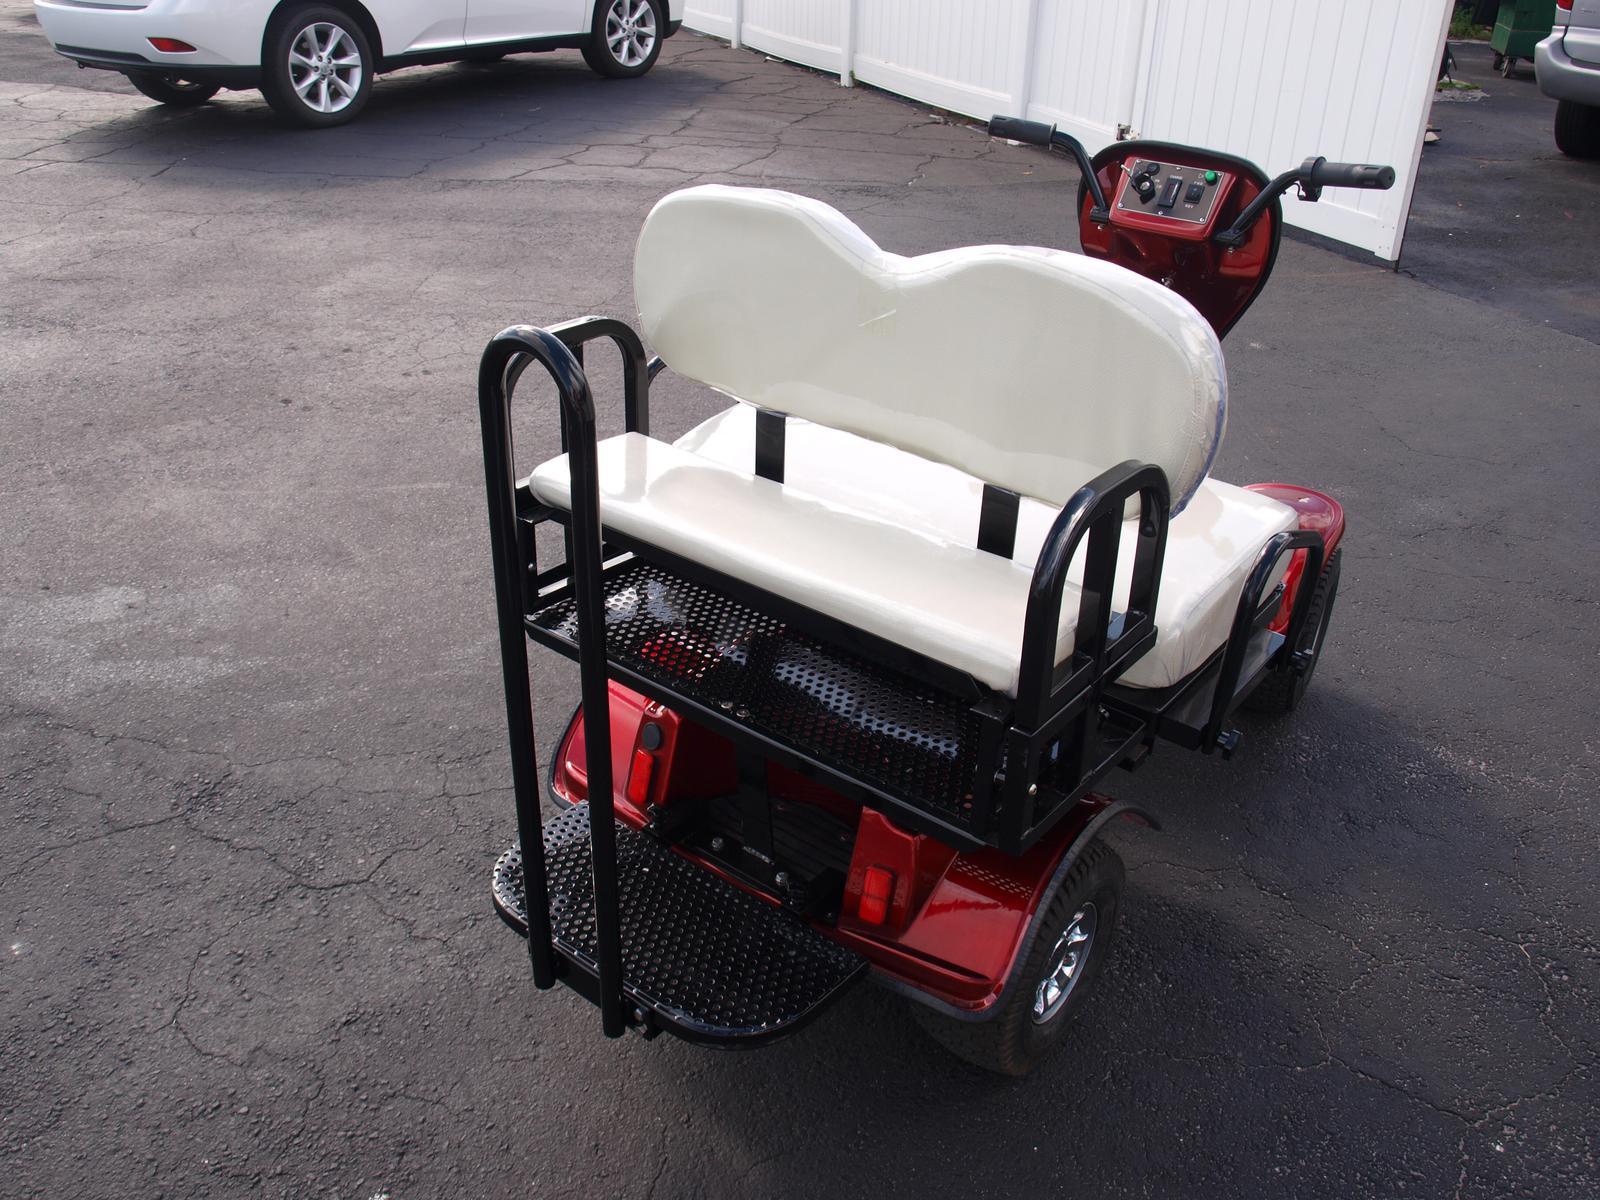 2019 Cricket Cricket Mini Golf Cart Model Esv With Optional Rear